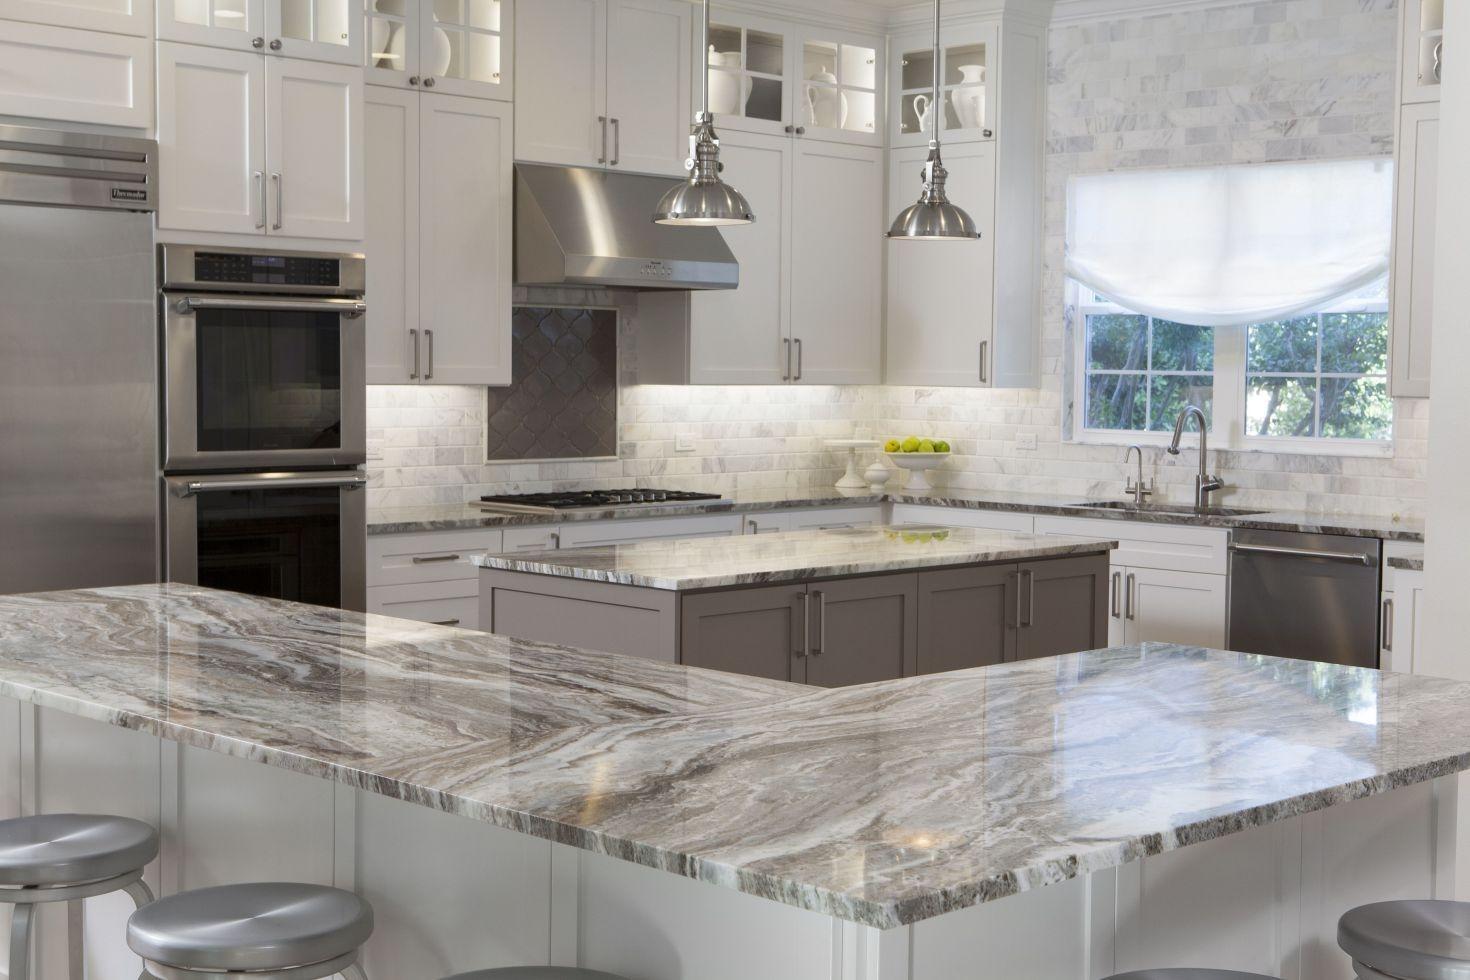 Admiring Granite Kitchen Countertops Ideas That You Shouldnt Miss22